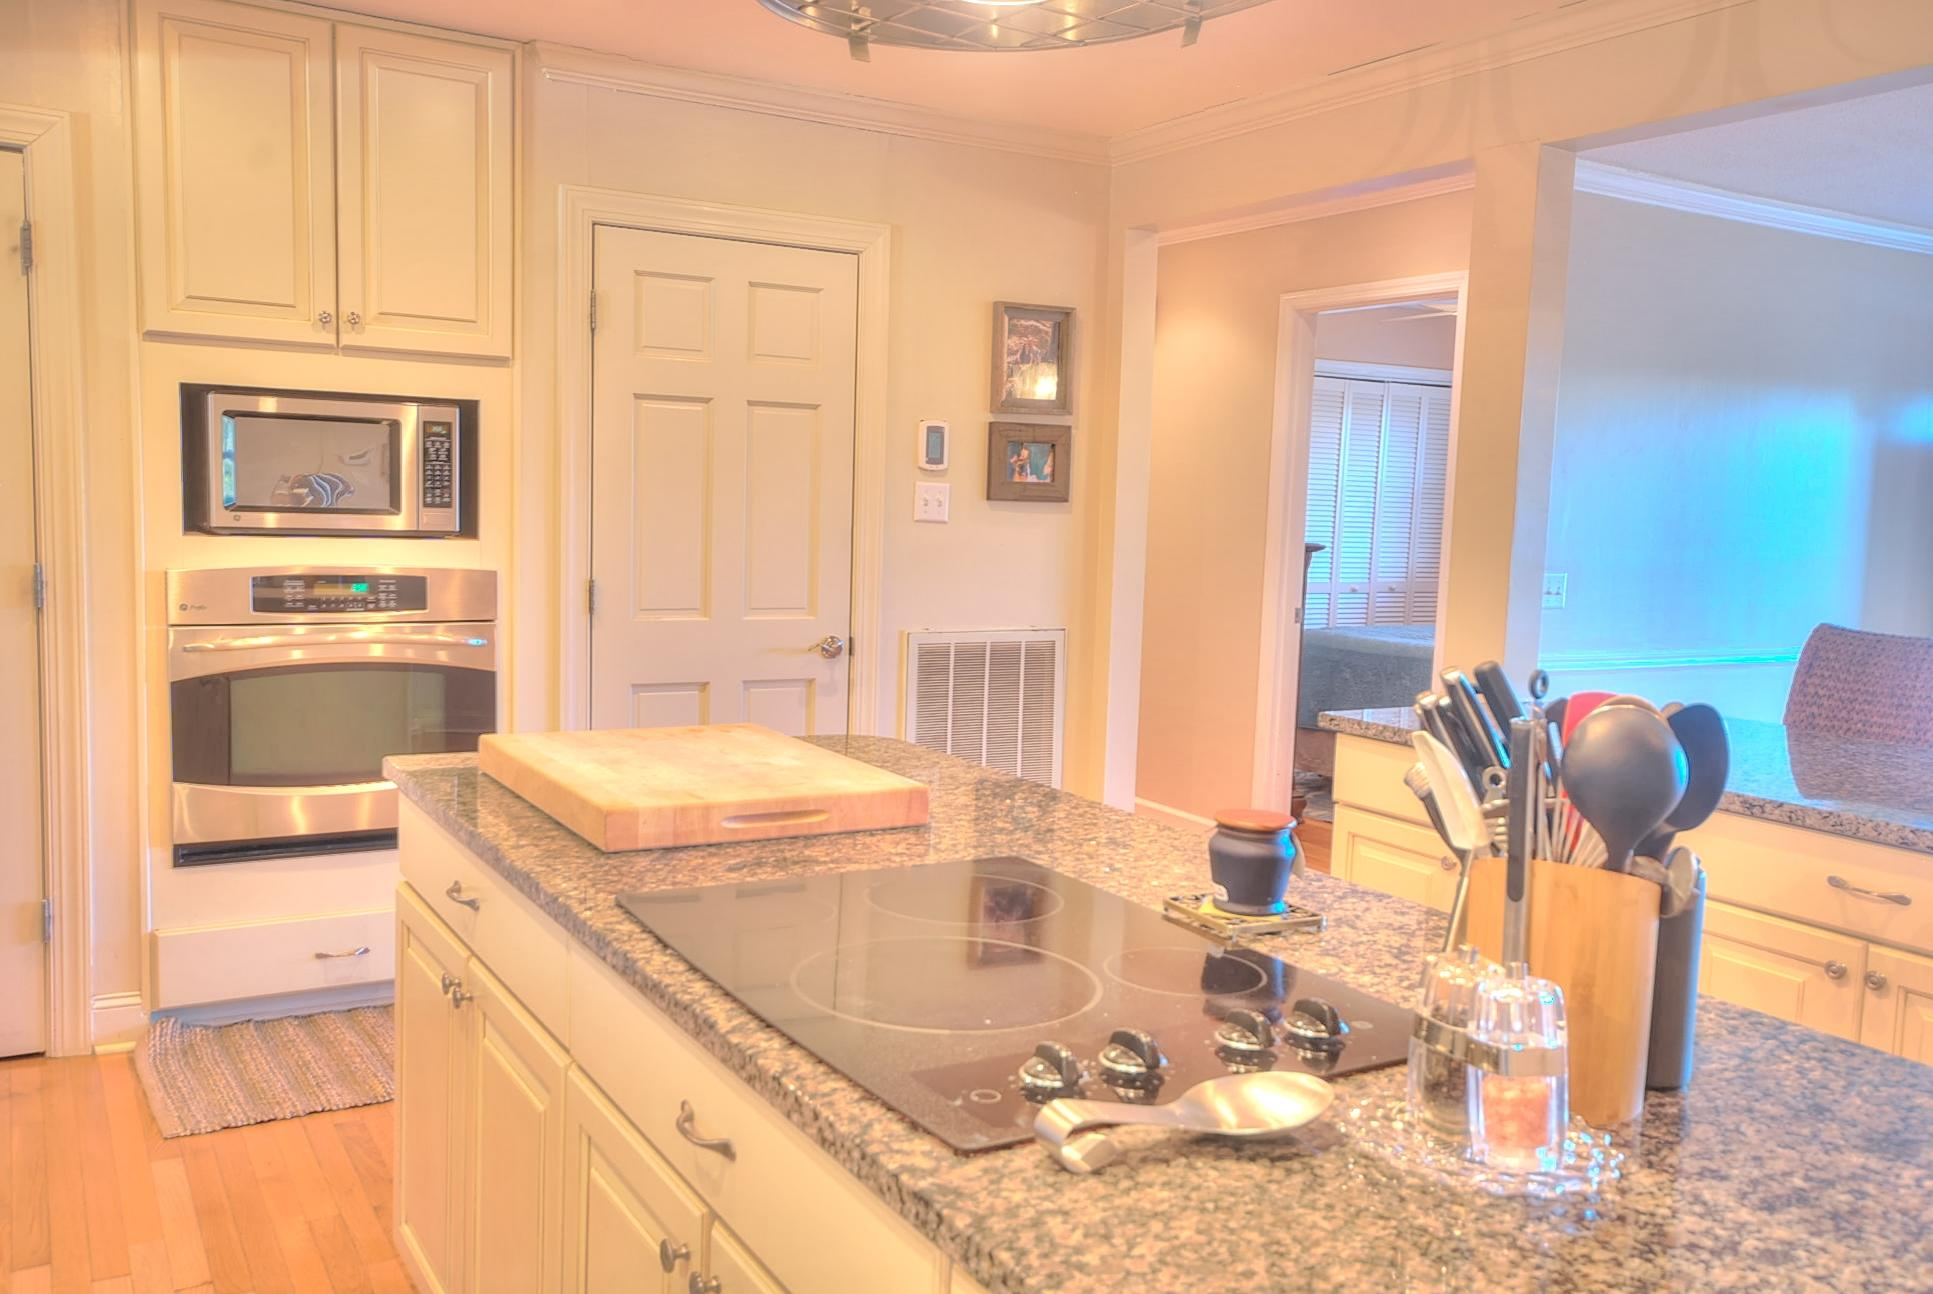 Capri Isles Homes For Sale - 213 Wappoo, Charleston, SC - 35